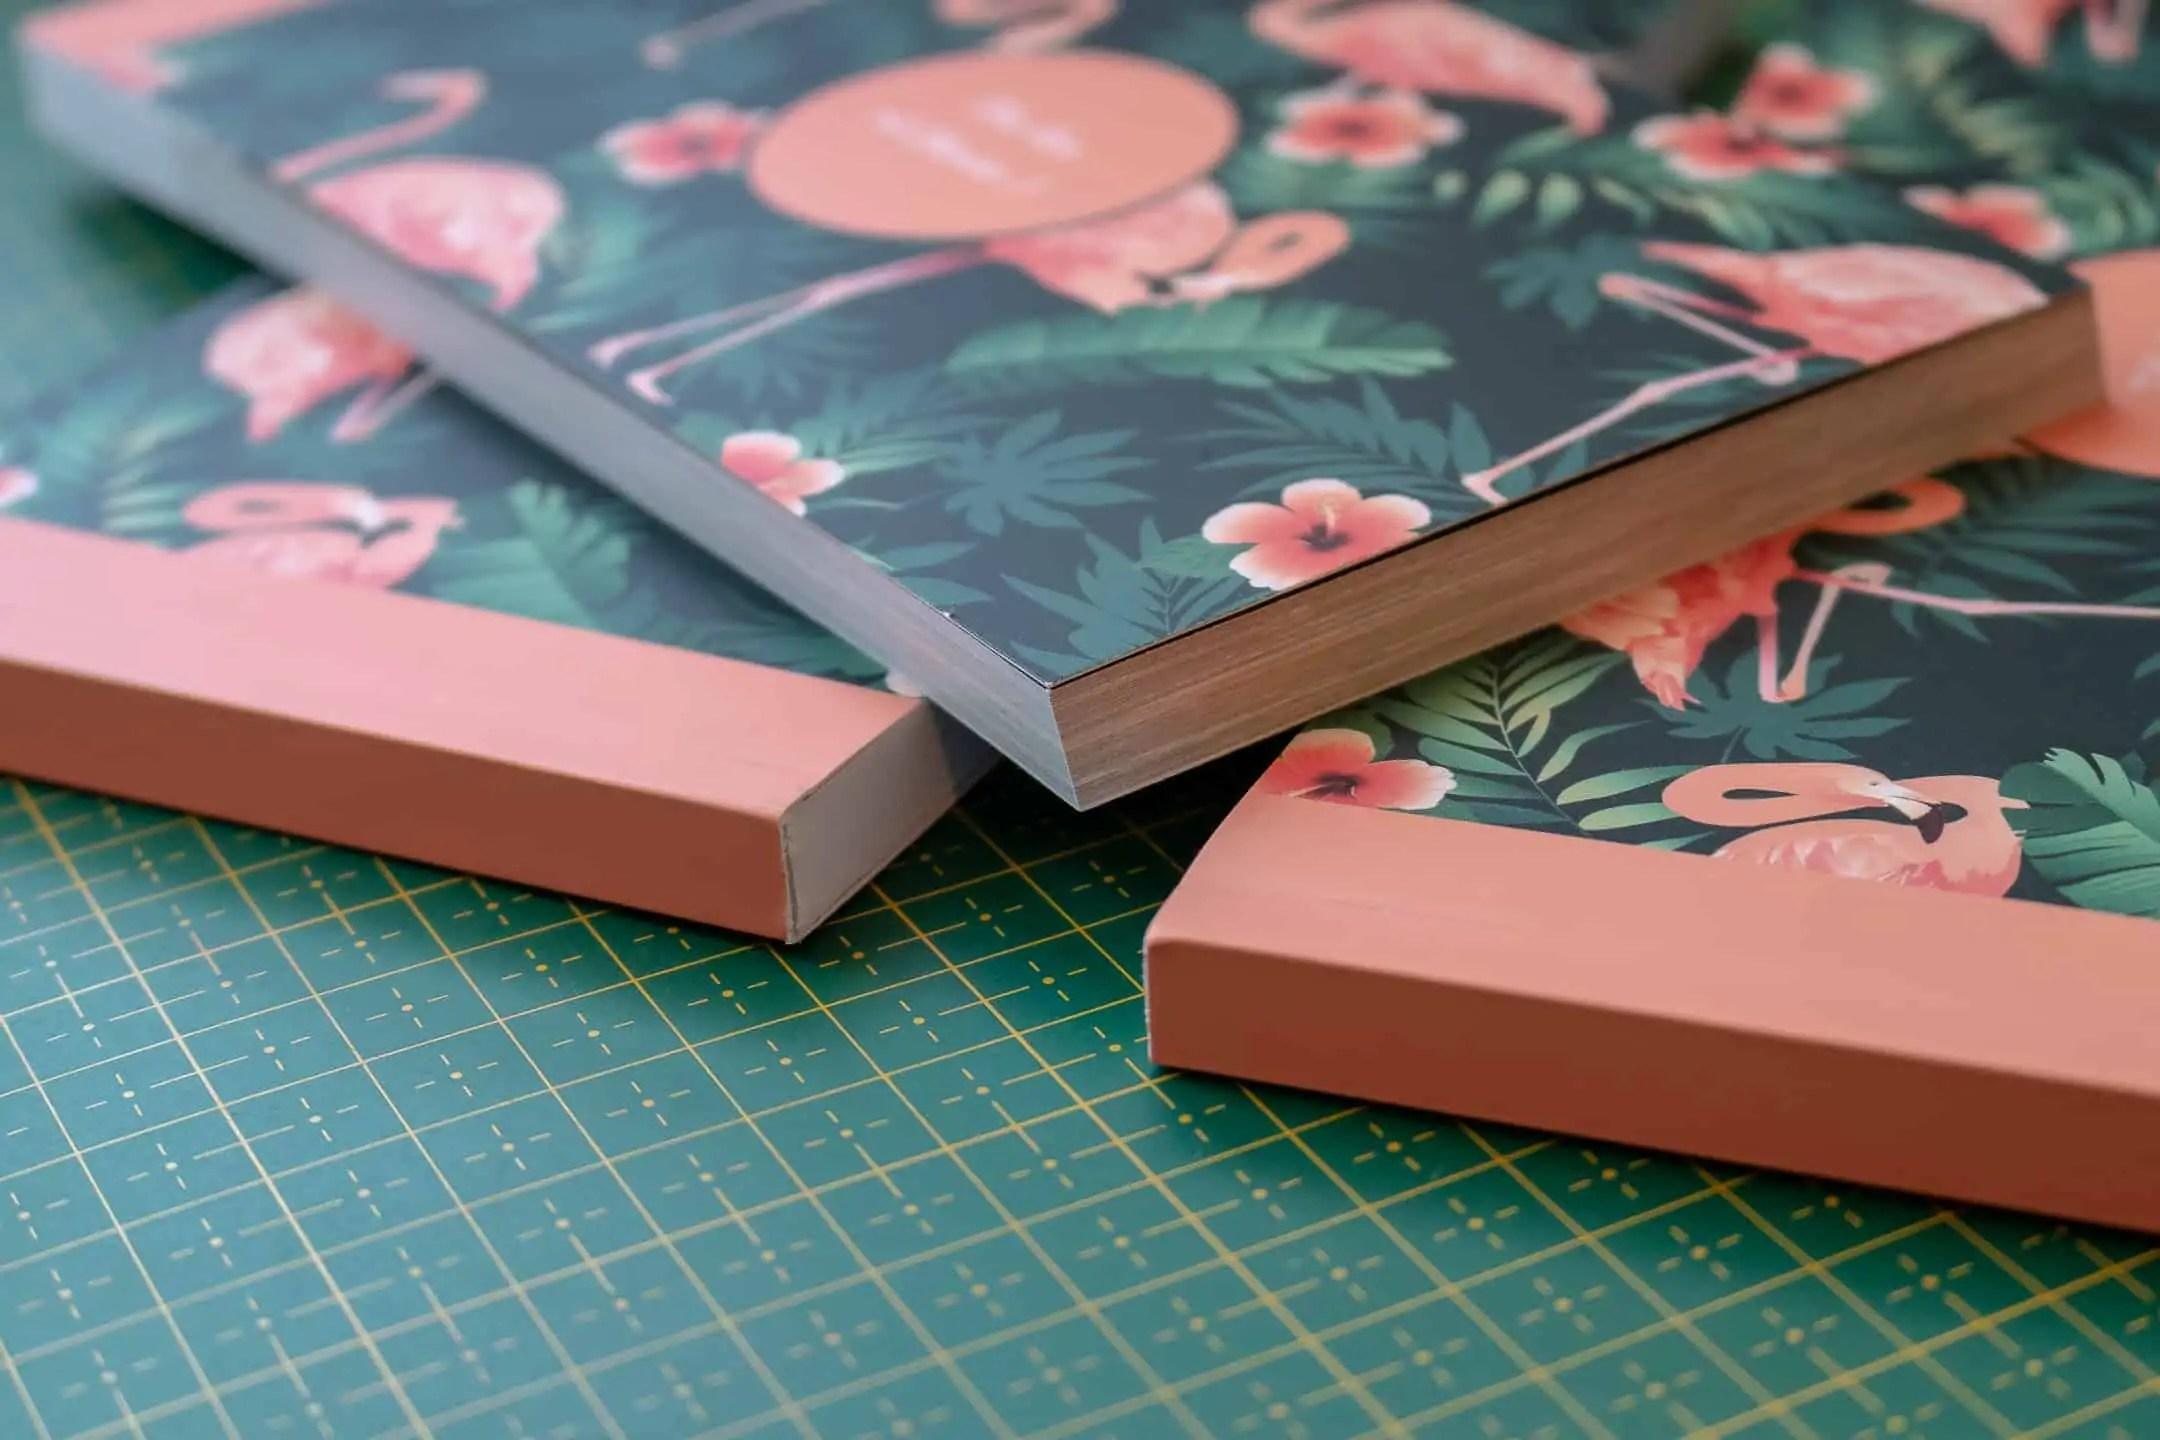 Mini ksiażka fotograficzna Pixbook 8 - Mini książka fotograficzna  Pixbook. Czy warto ?